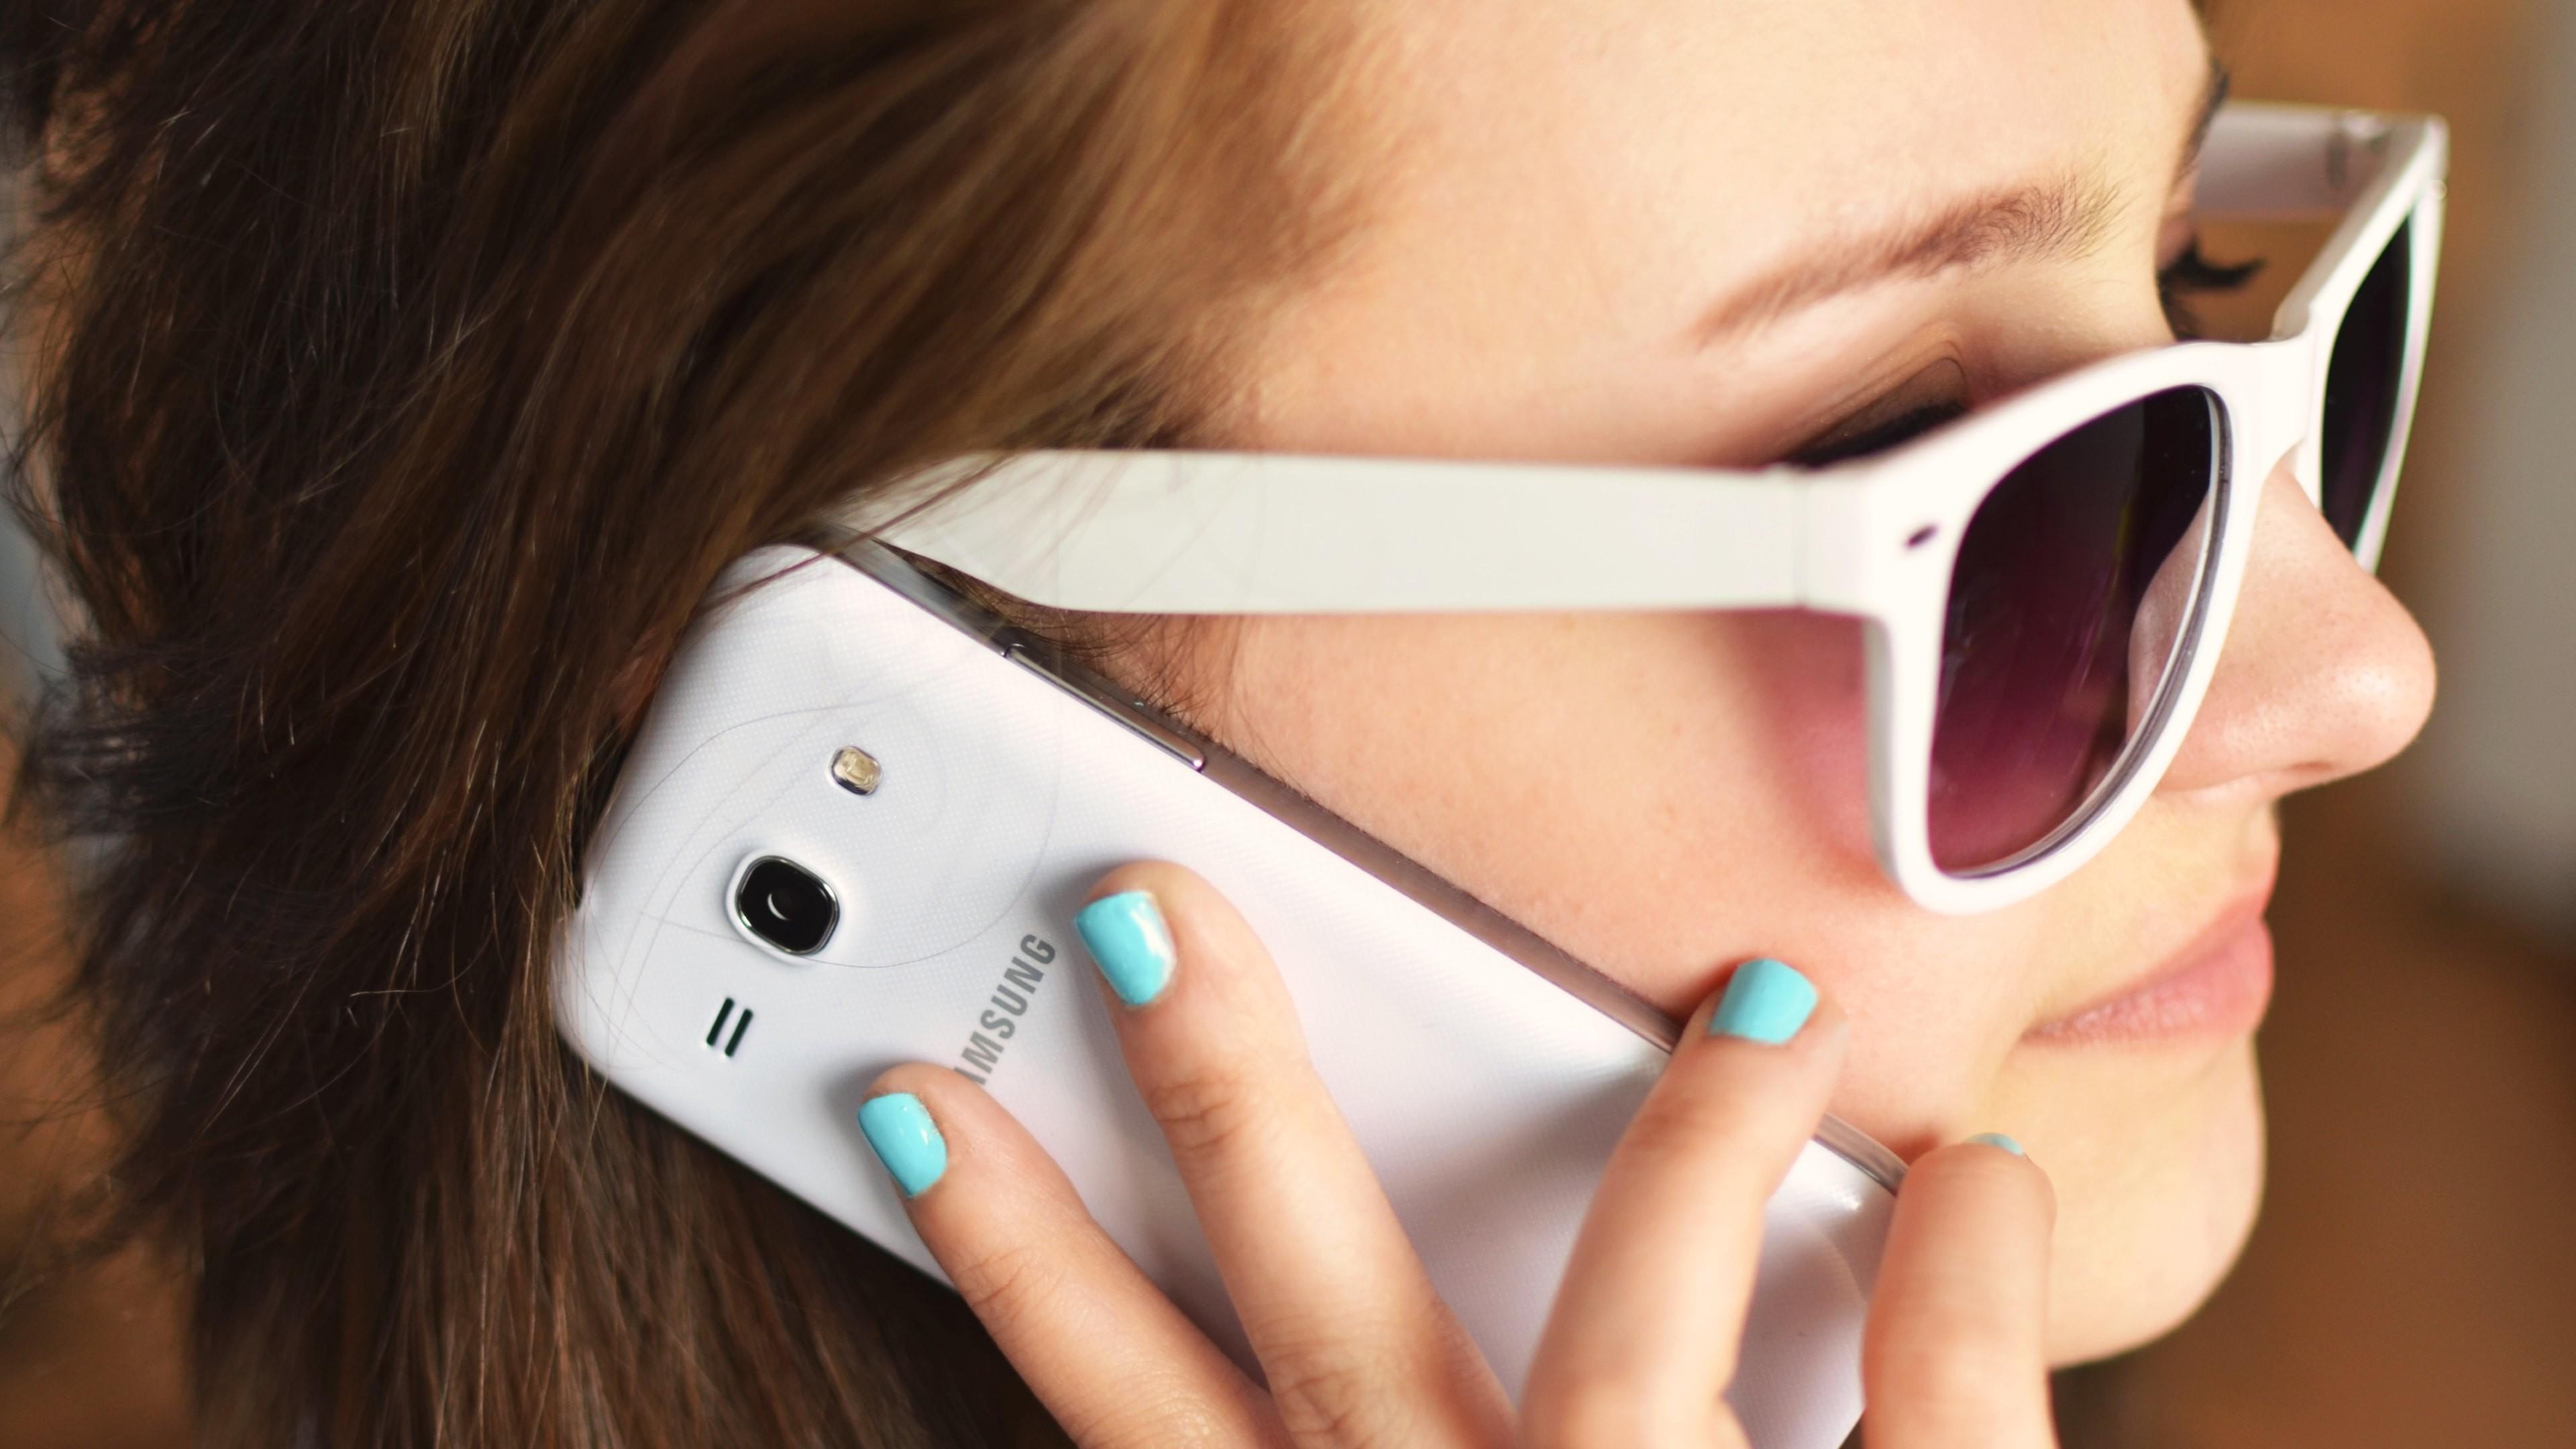 Girl Talking on Phone Wallpapers · 4K HD Desktop Backgrounds Phone